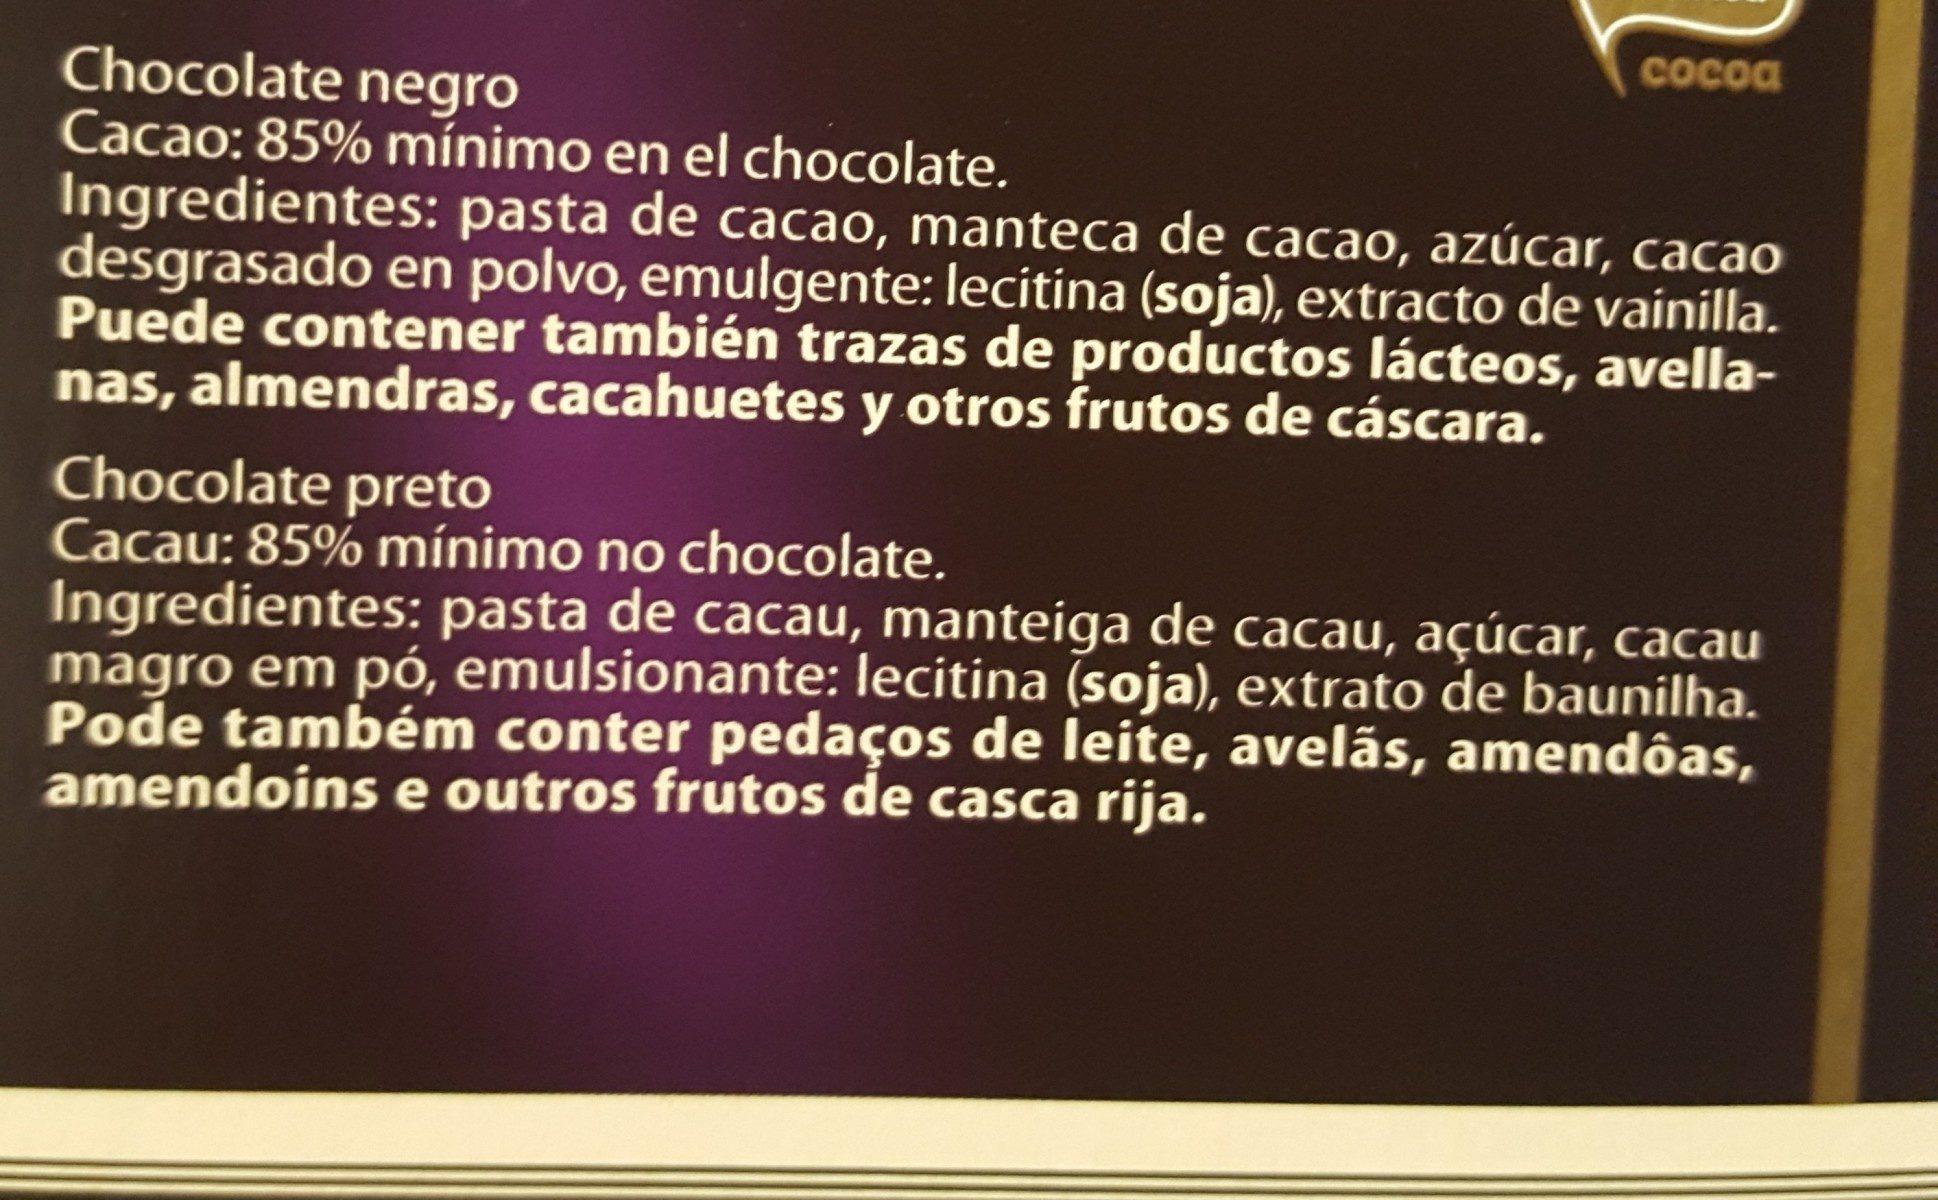 Chocolate negro 85% cacao - Ingrédients